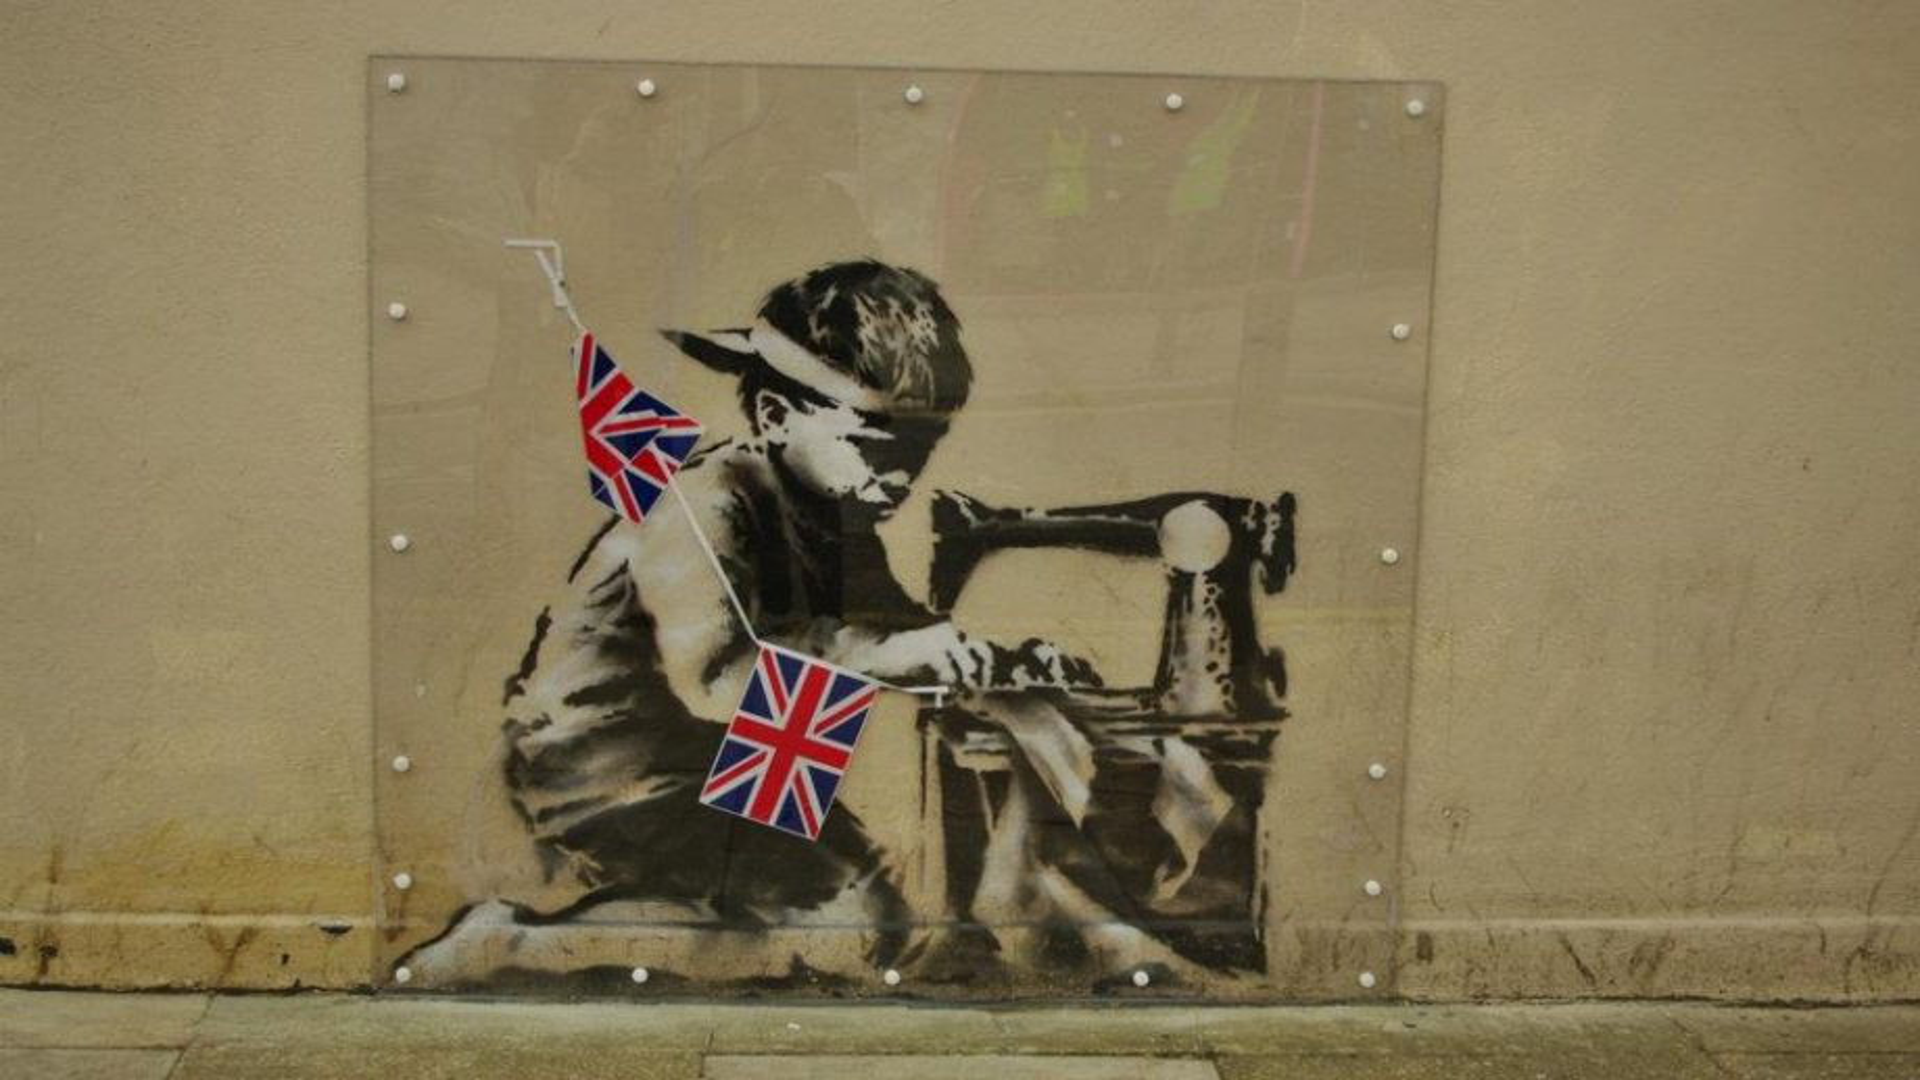 'Popagandist' Ron English intends to whitewash Banksy's $730,000 piece Slave Labour